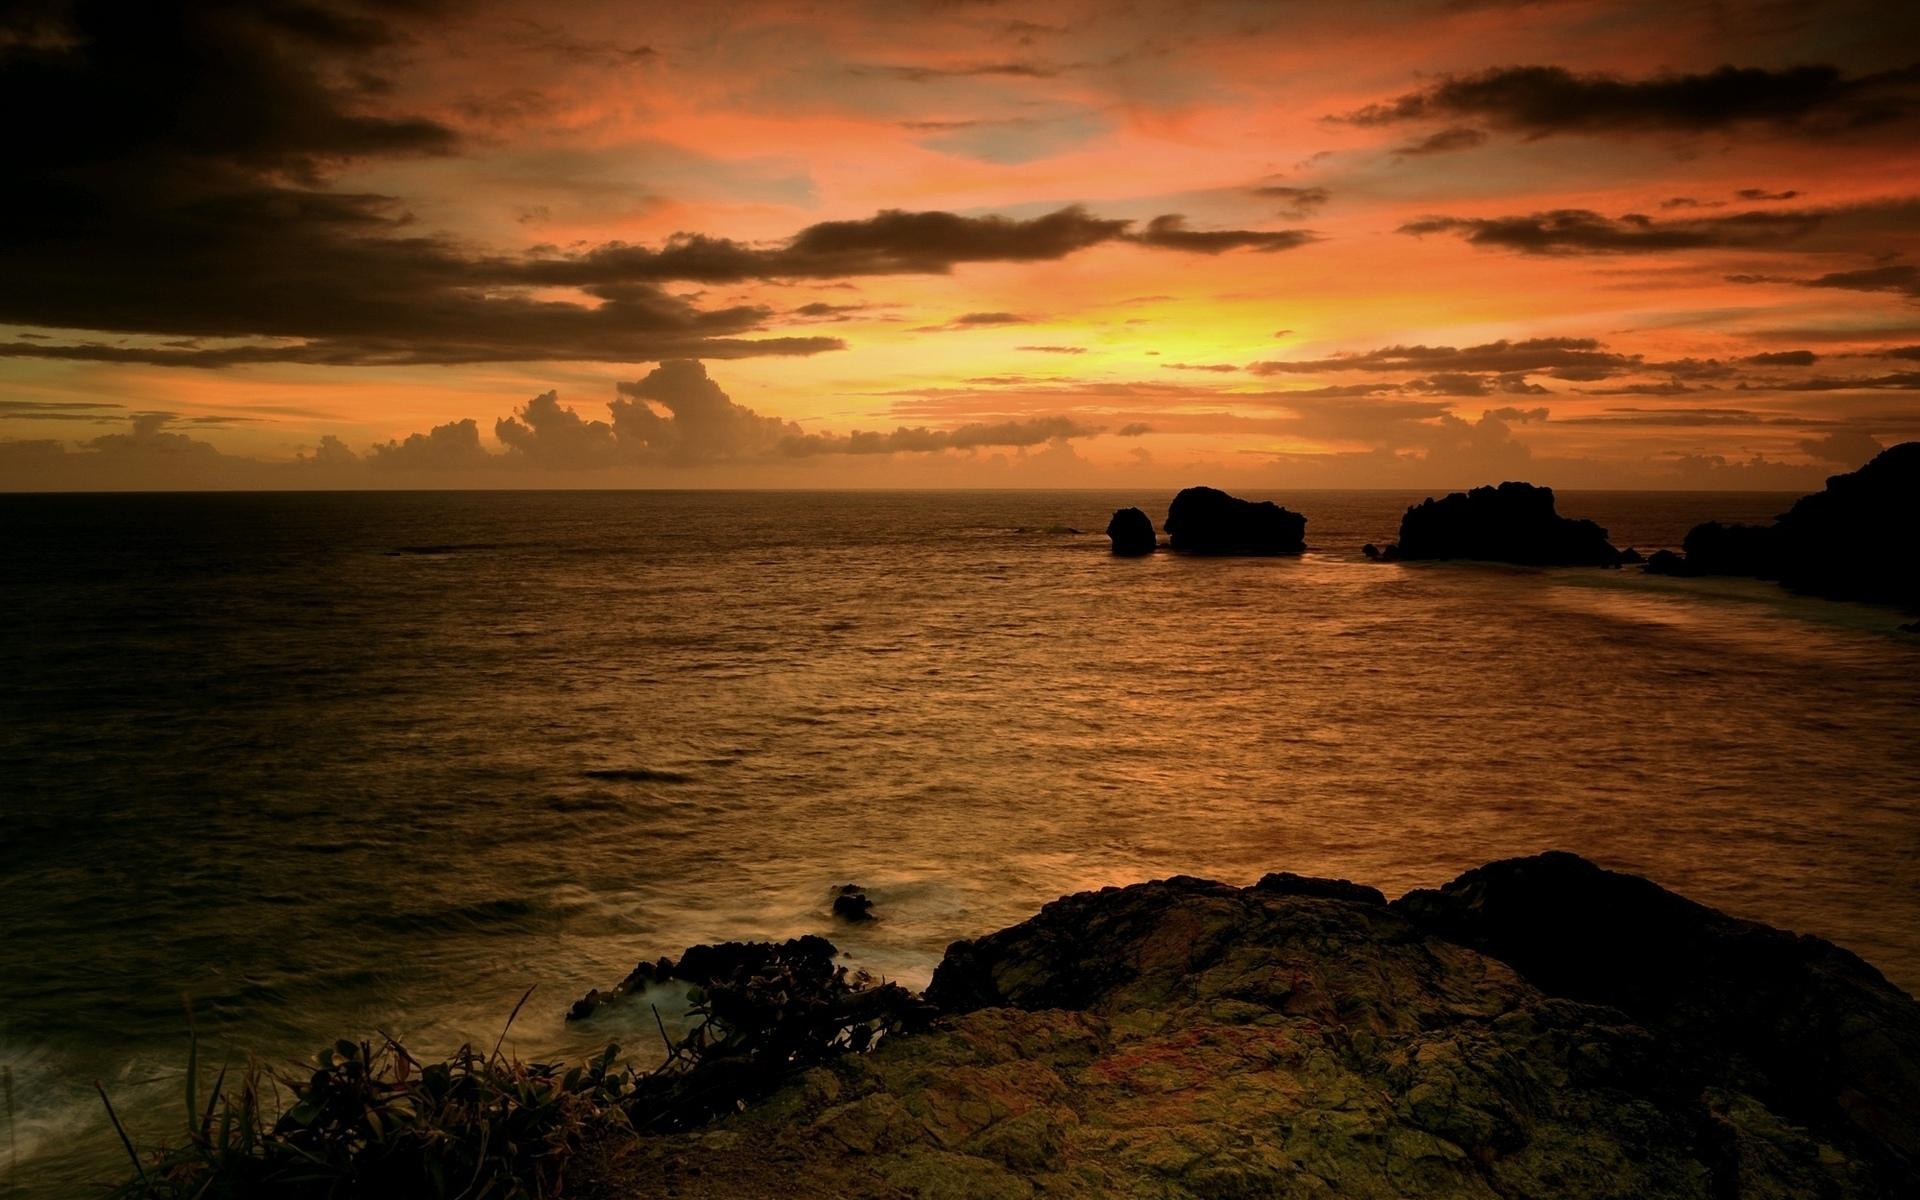 вечерний пейзаж на море картинки оформленный